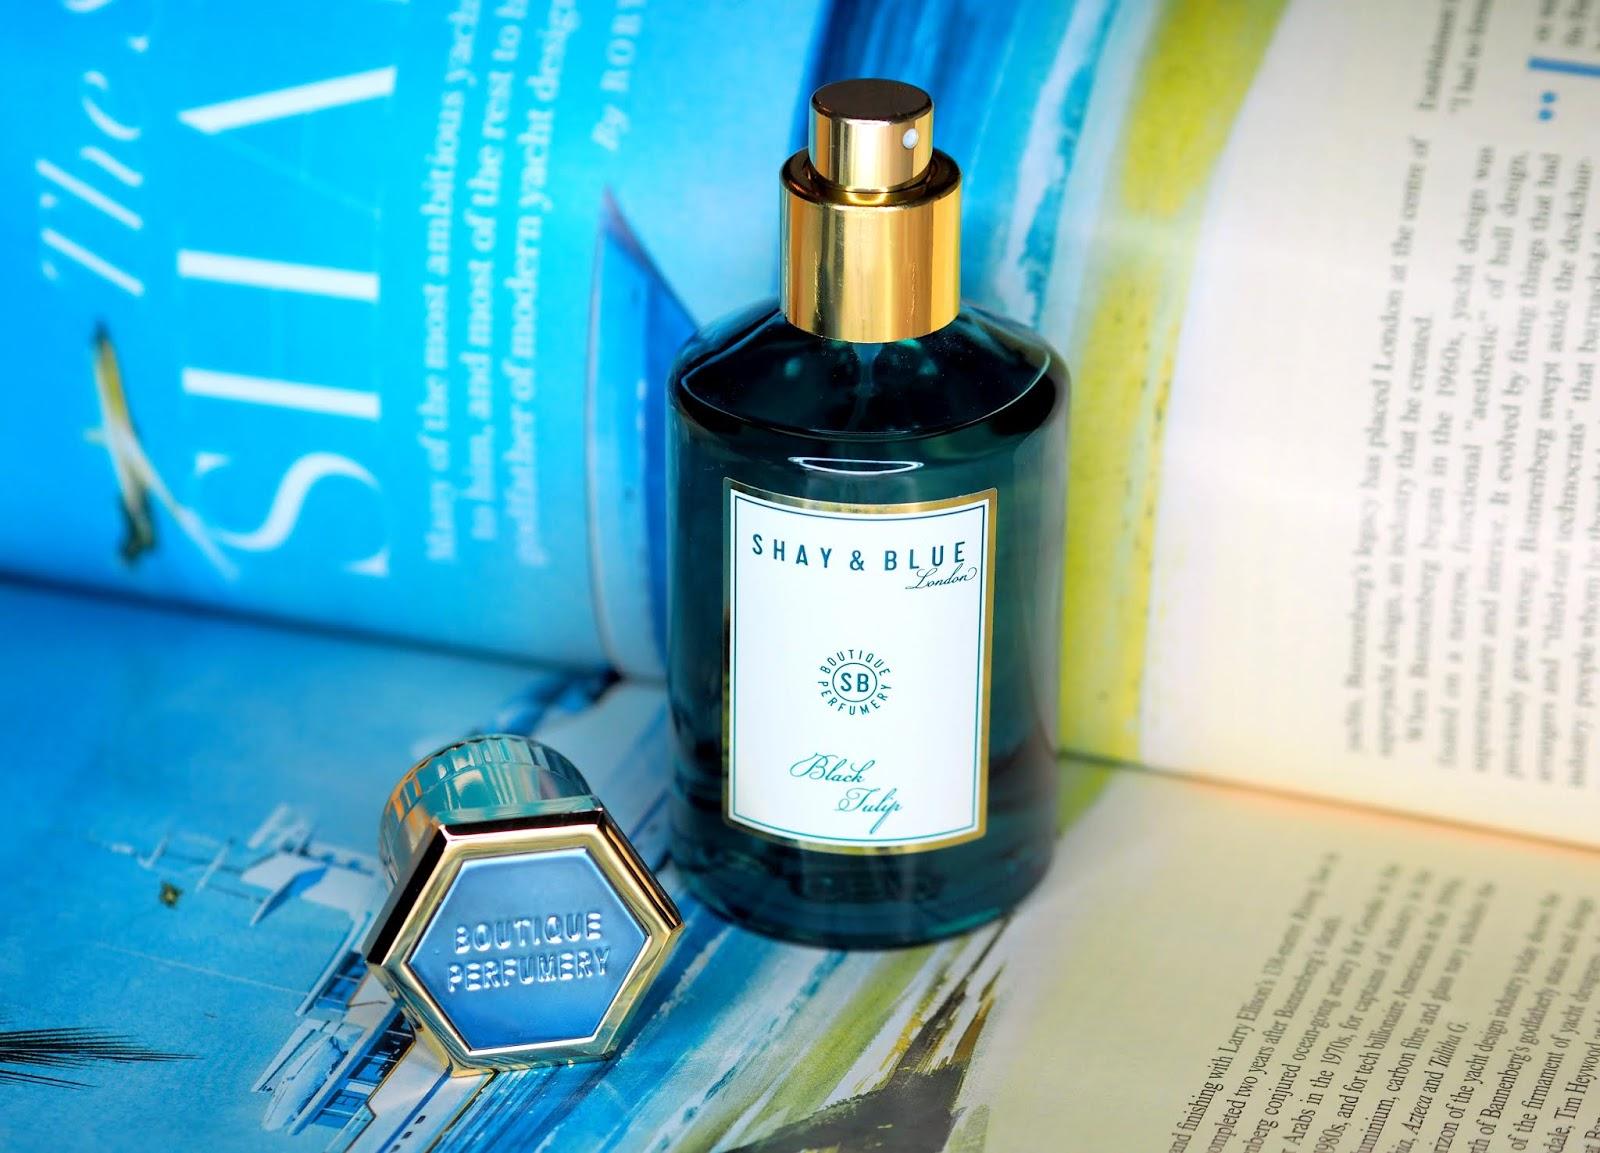 Shay and Blue Black Tulip Perfume